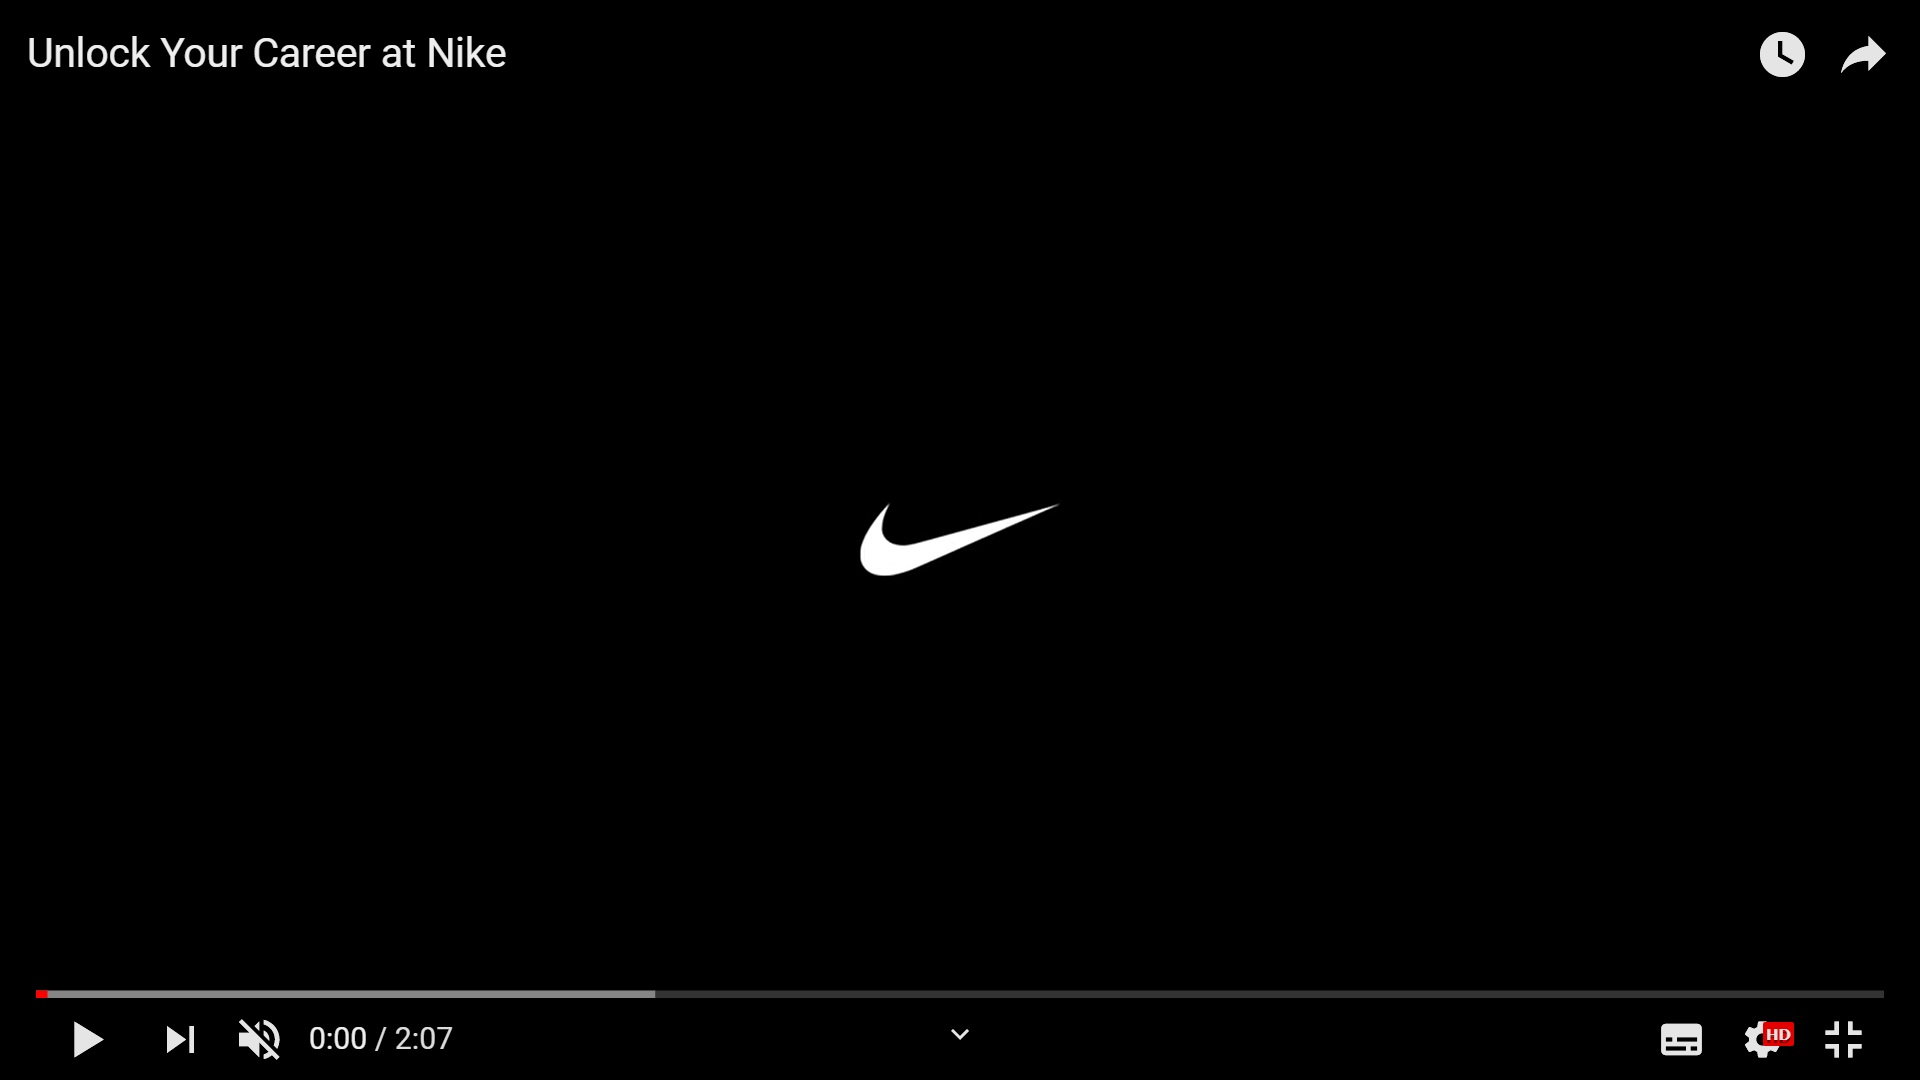 Link zu Recruiting Video von Nike